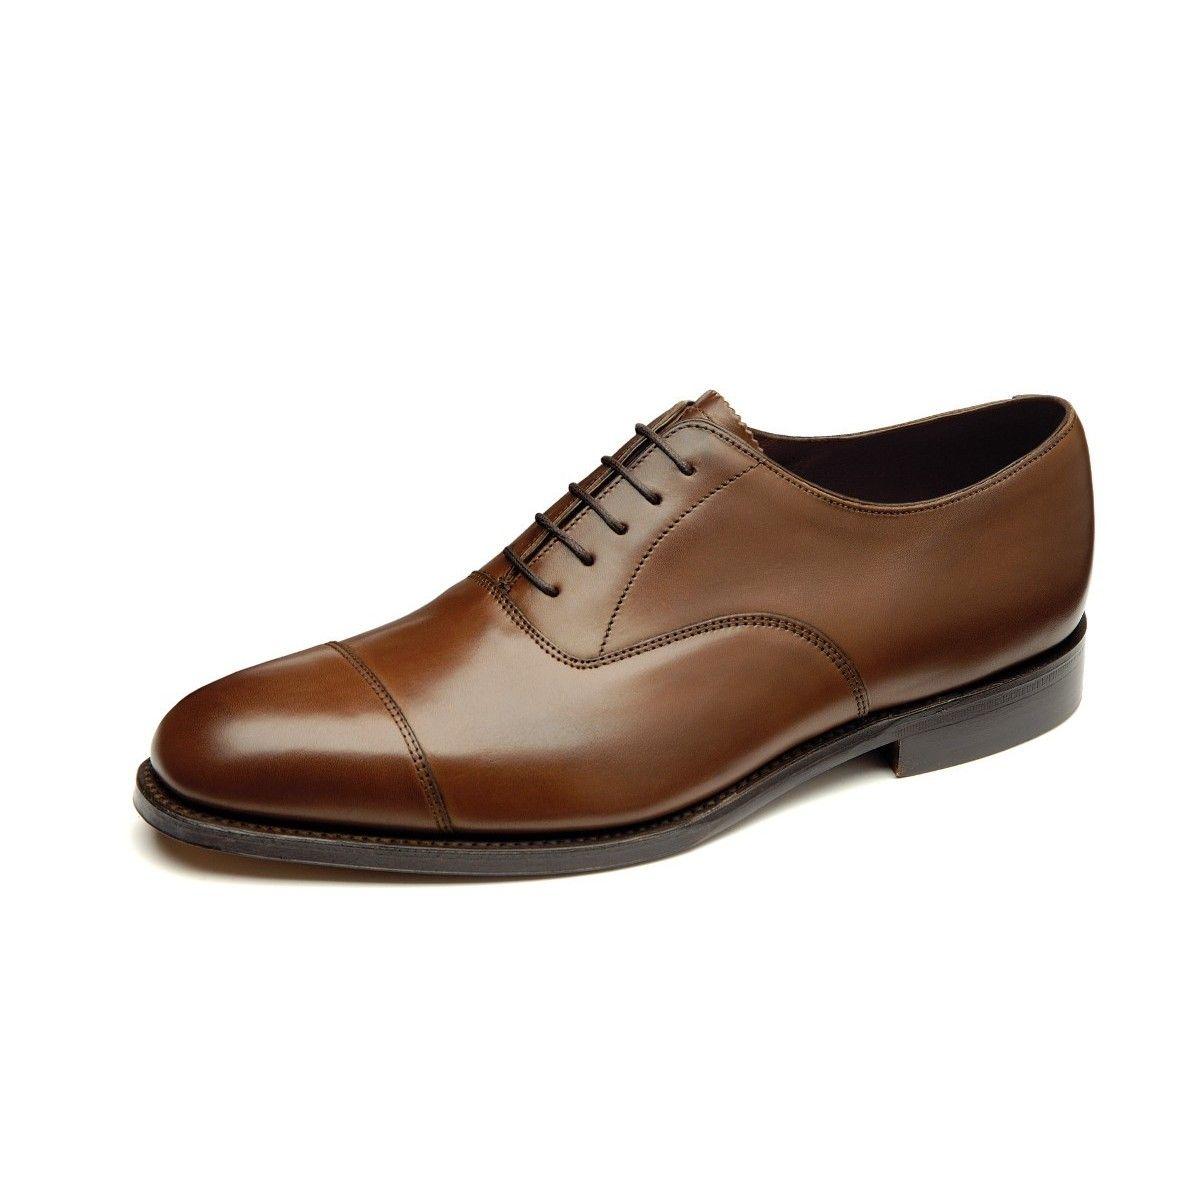 Loake Aldwych Men's shoes by Loake Quality Footwear